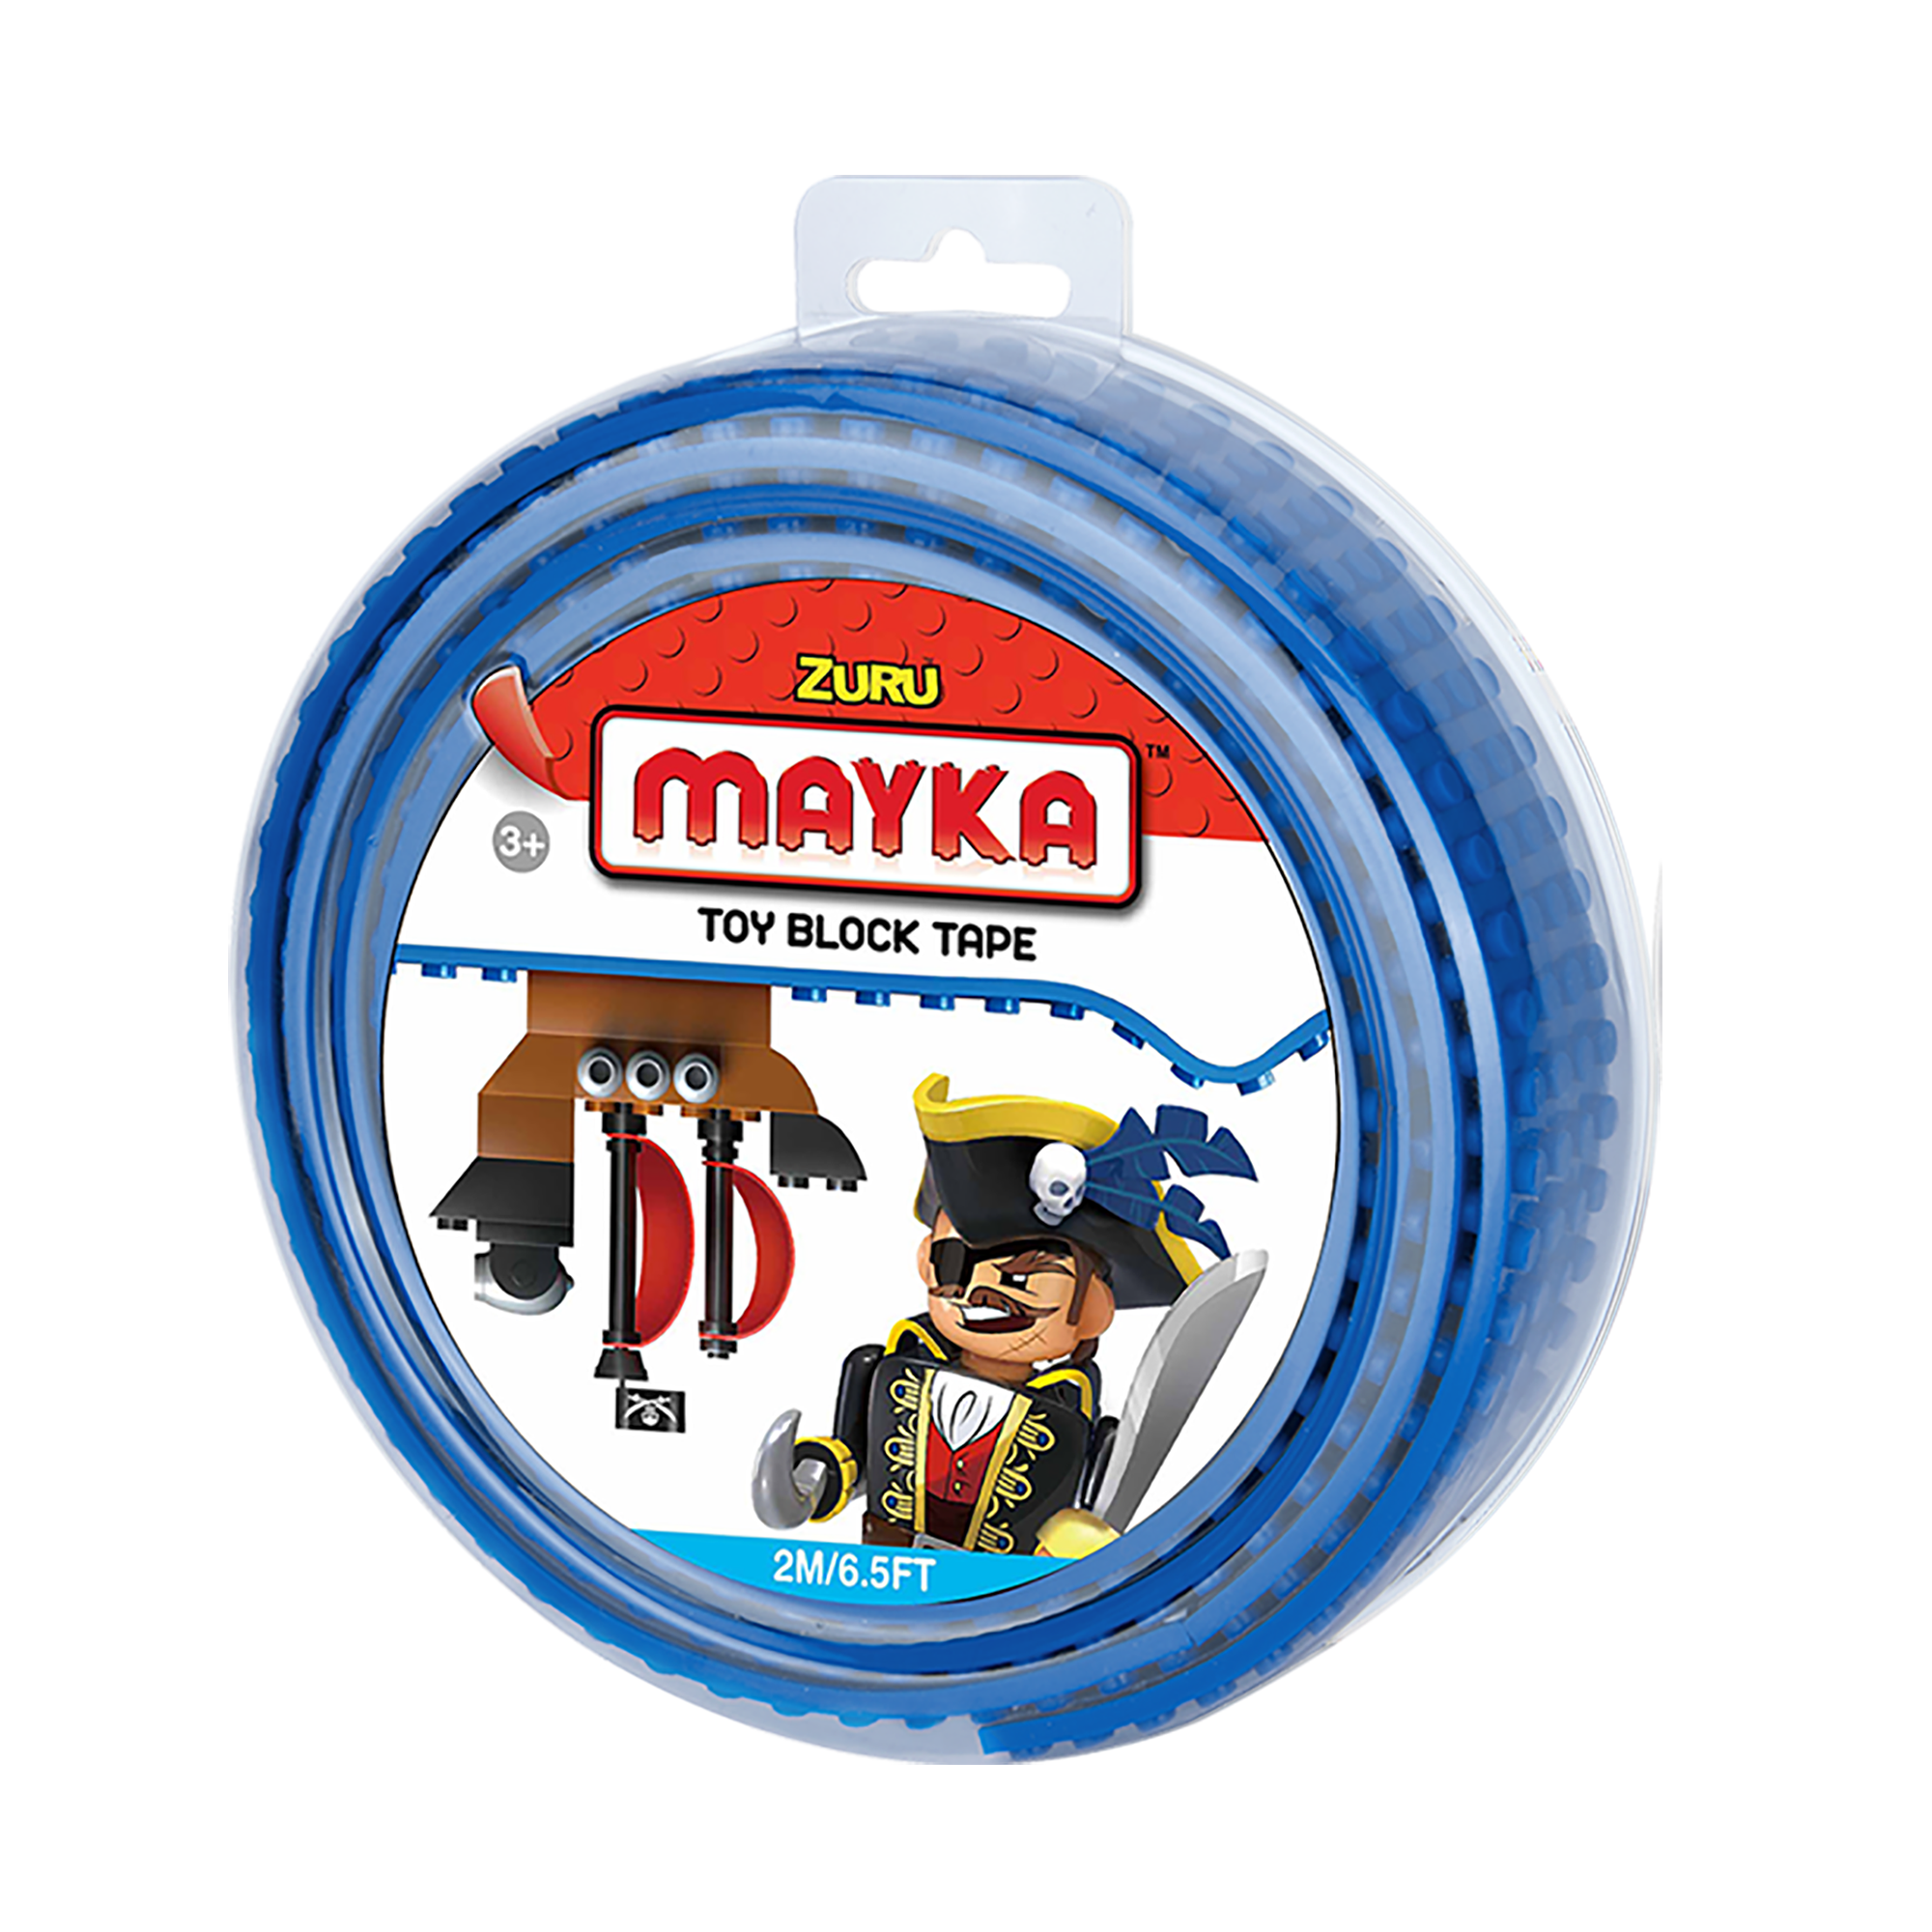 Mayka Toy Block Tape, 6.5ft 4-stud (Blue)